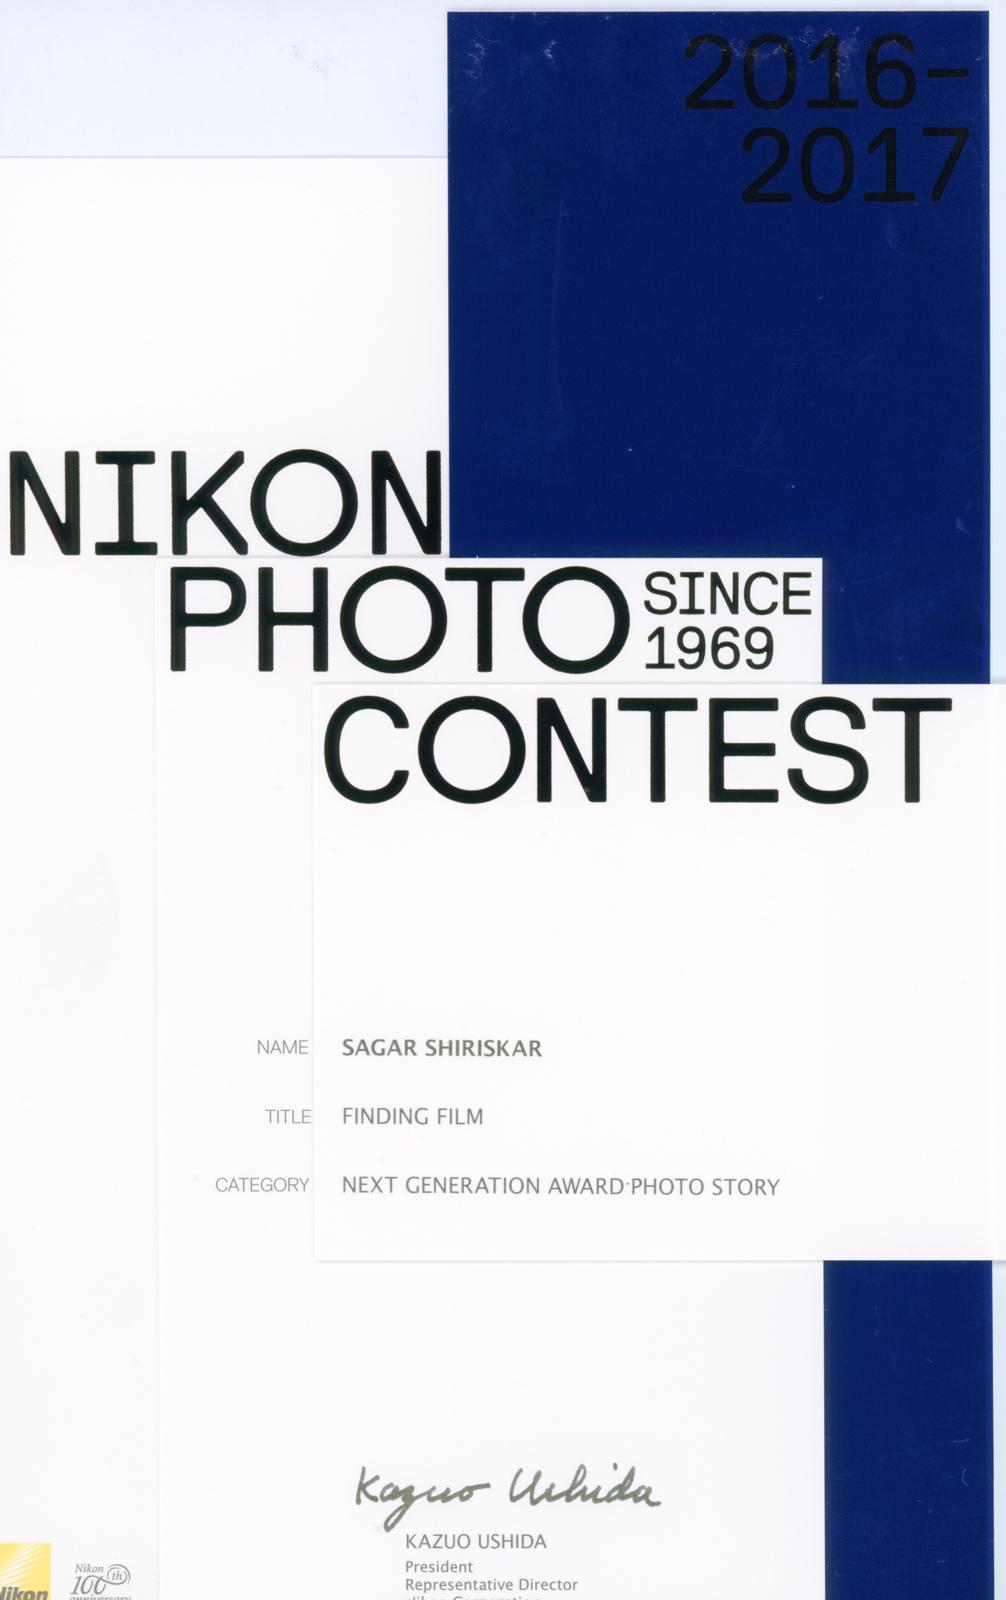 Winner Next Generation Award, Photo Story, 2017 - NIKON PHOTO CONTEST.jpg